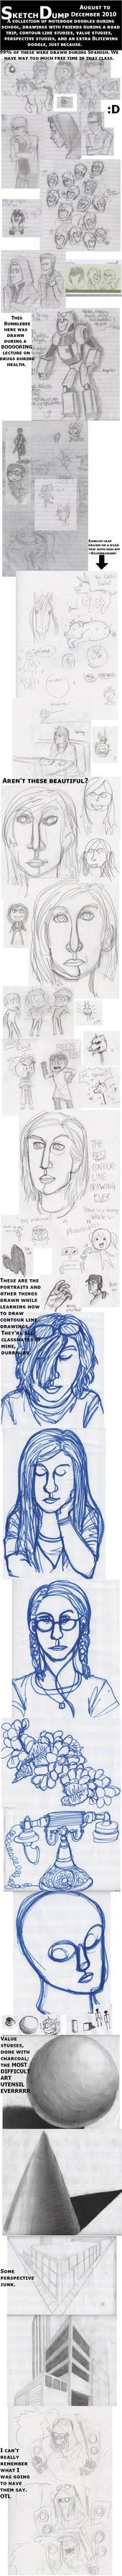 Another Sketch Dump by NekoNikora